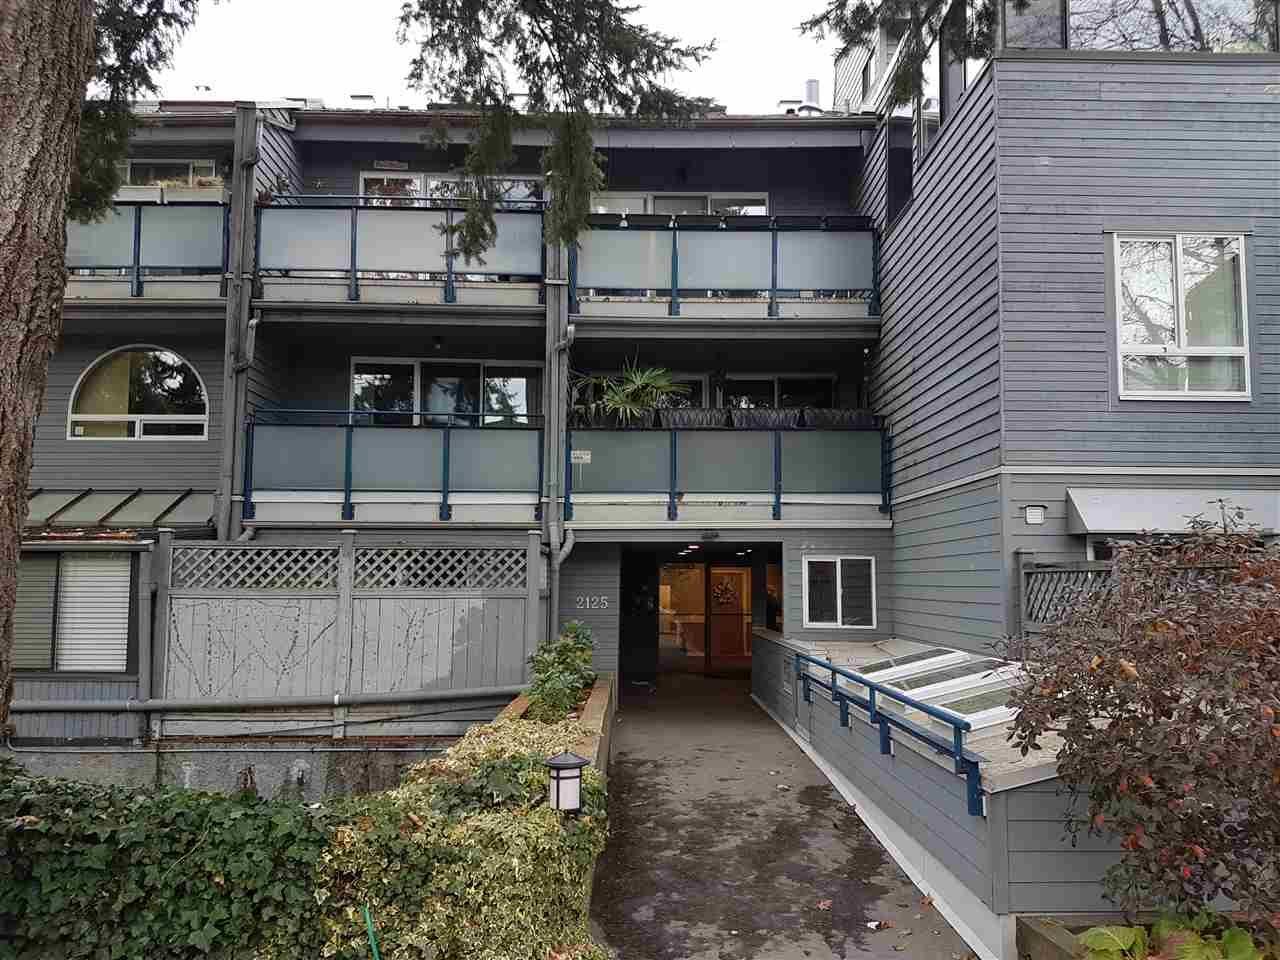 Main Photo: 203 2125 YORK Avenue in Vancouver: Kitsilano Condo for sale (Vancouver West)  : MLS®# R2224246